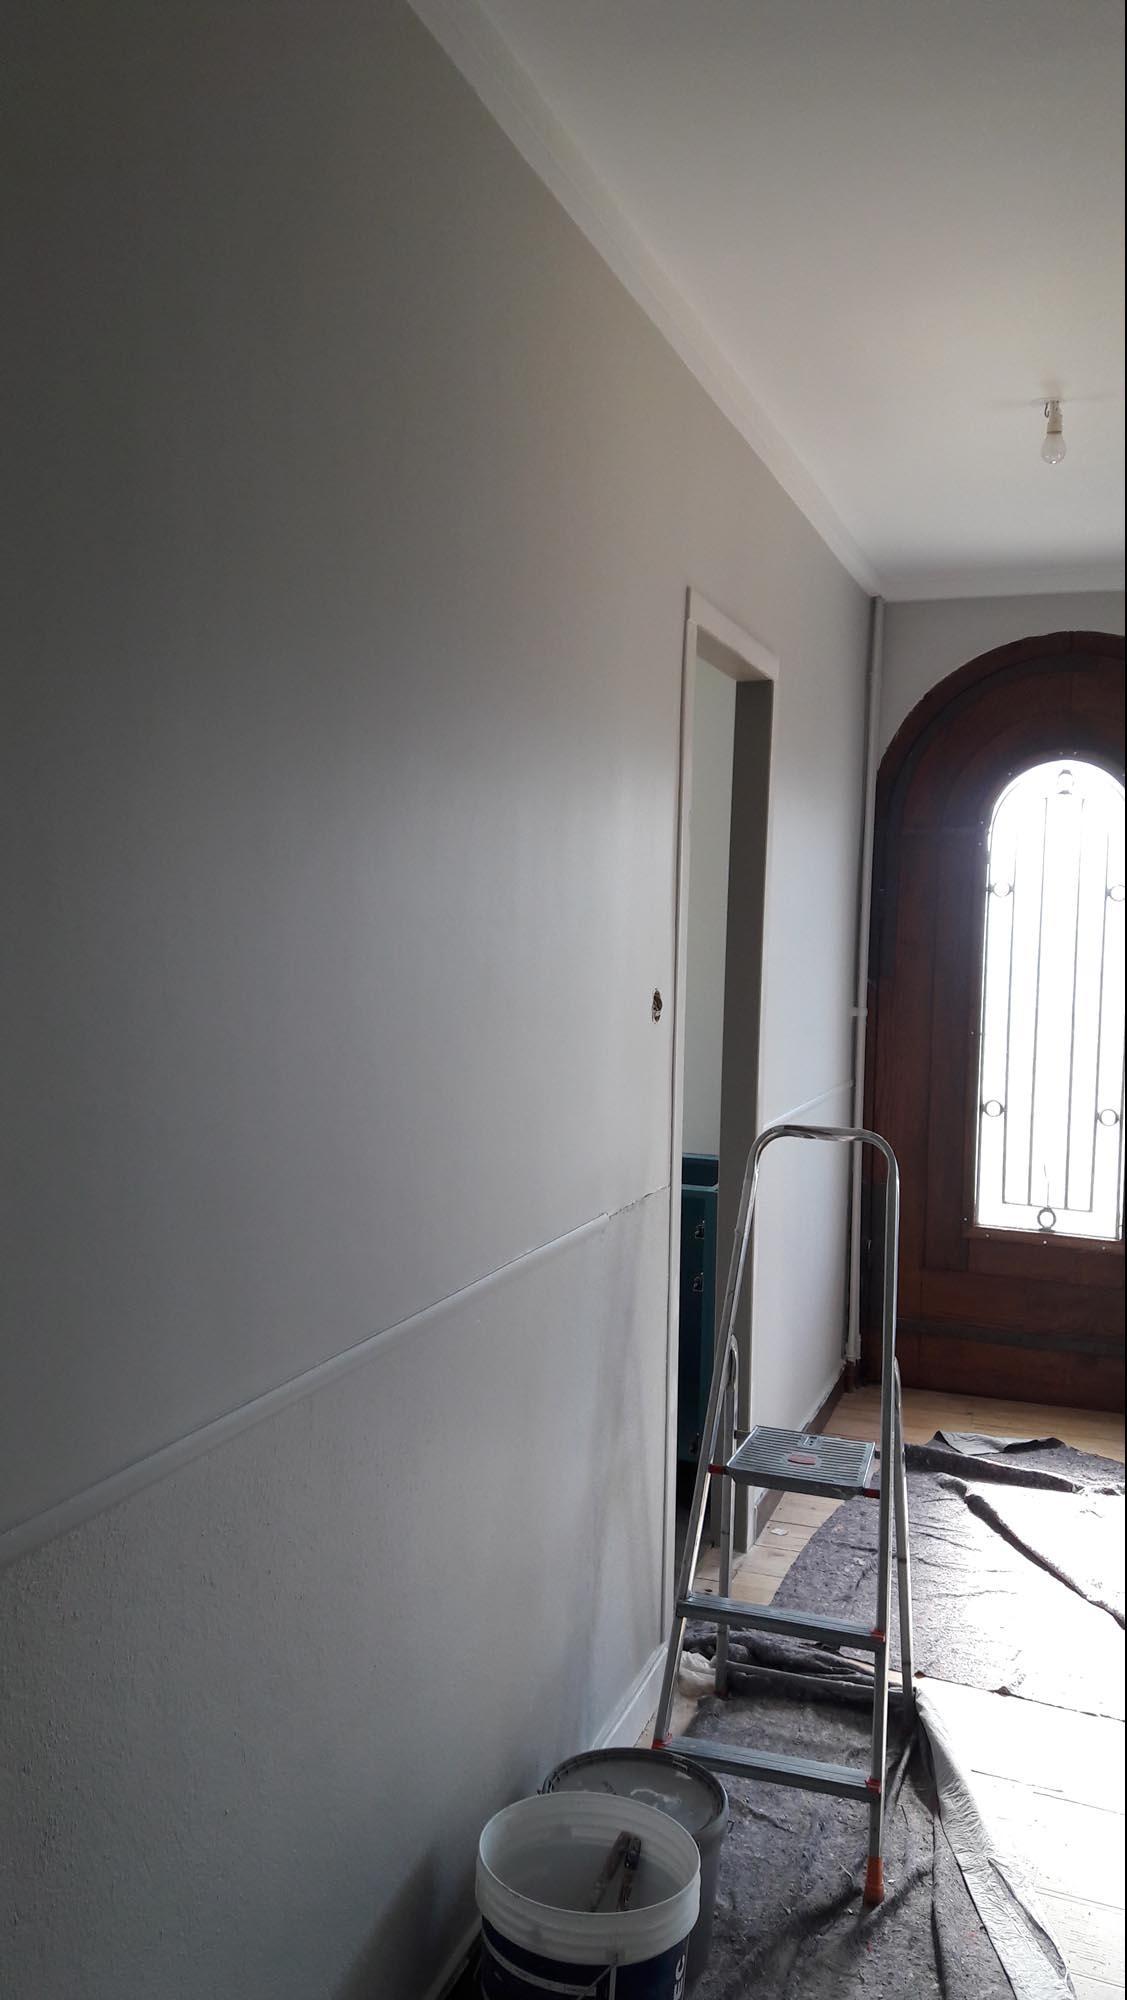 Chantier rénovation Le Monastier mai 2020